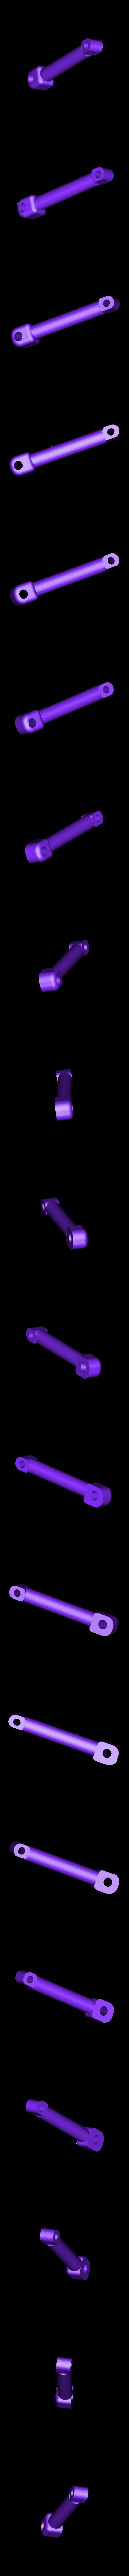 shocker1.stl Download STL file 34' Ford Pickup Hot Rod • 3D printing object, macone1